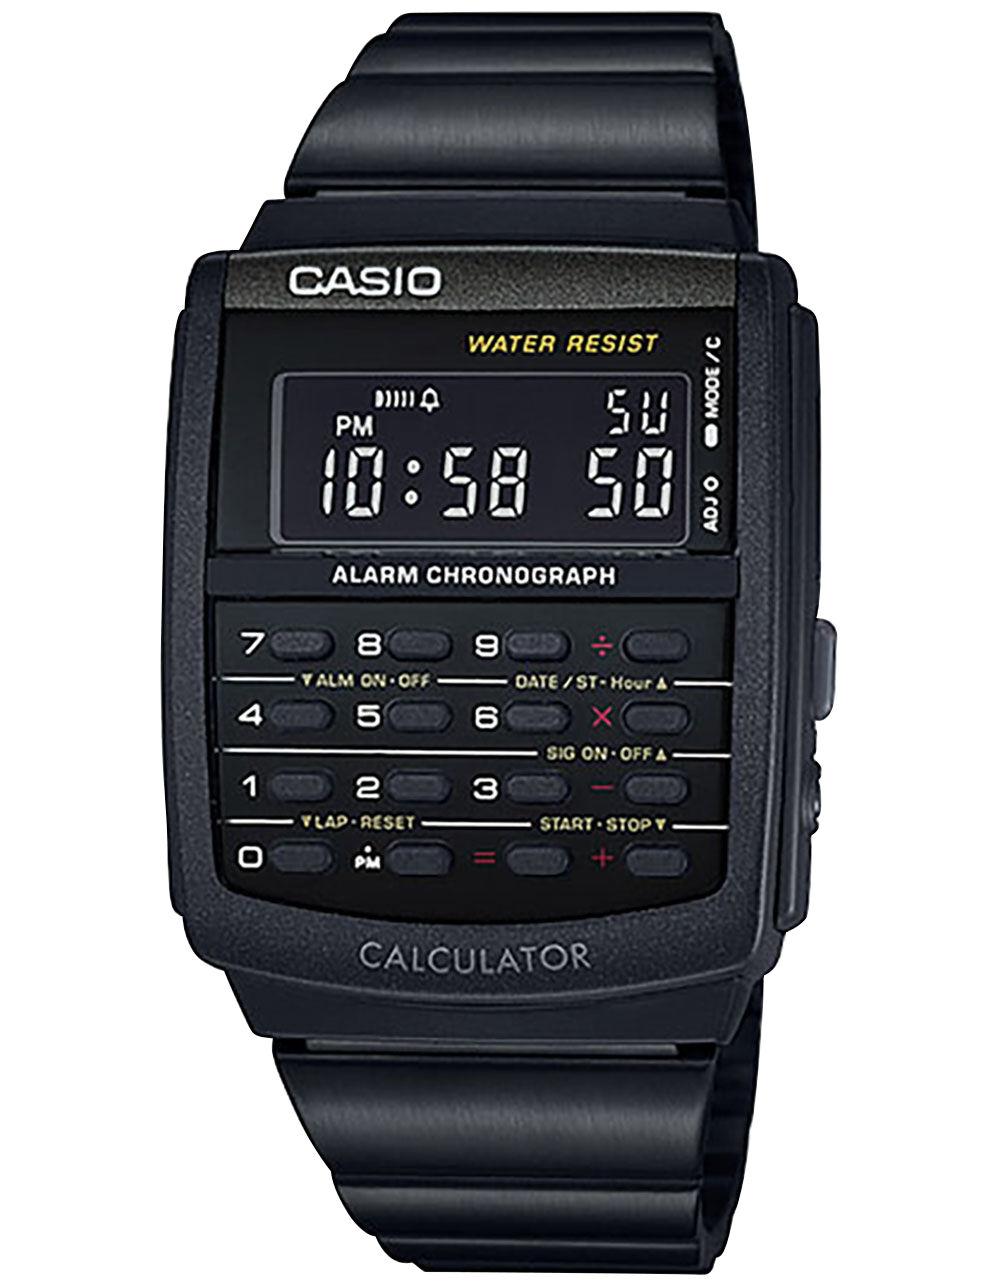 Image of CASIO CA506B-1AVT WATCH